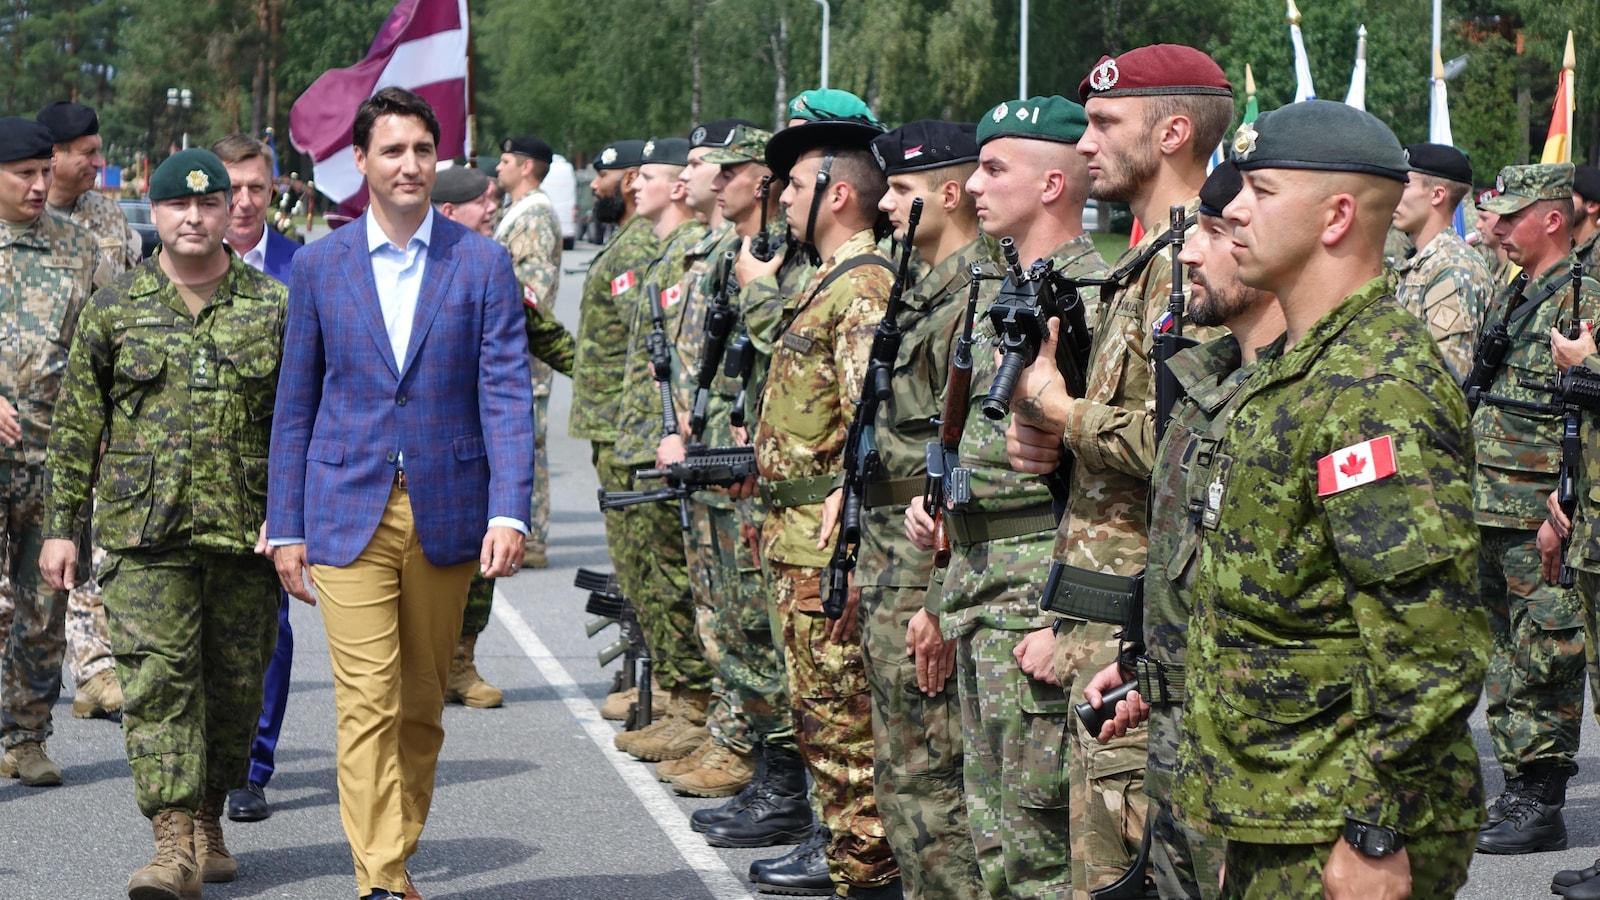 Justin Trudeau inspecte les troupes de l'OTAN dont les soldats sont en rang.